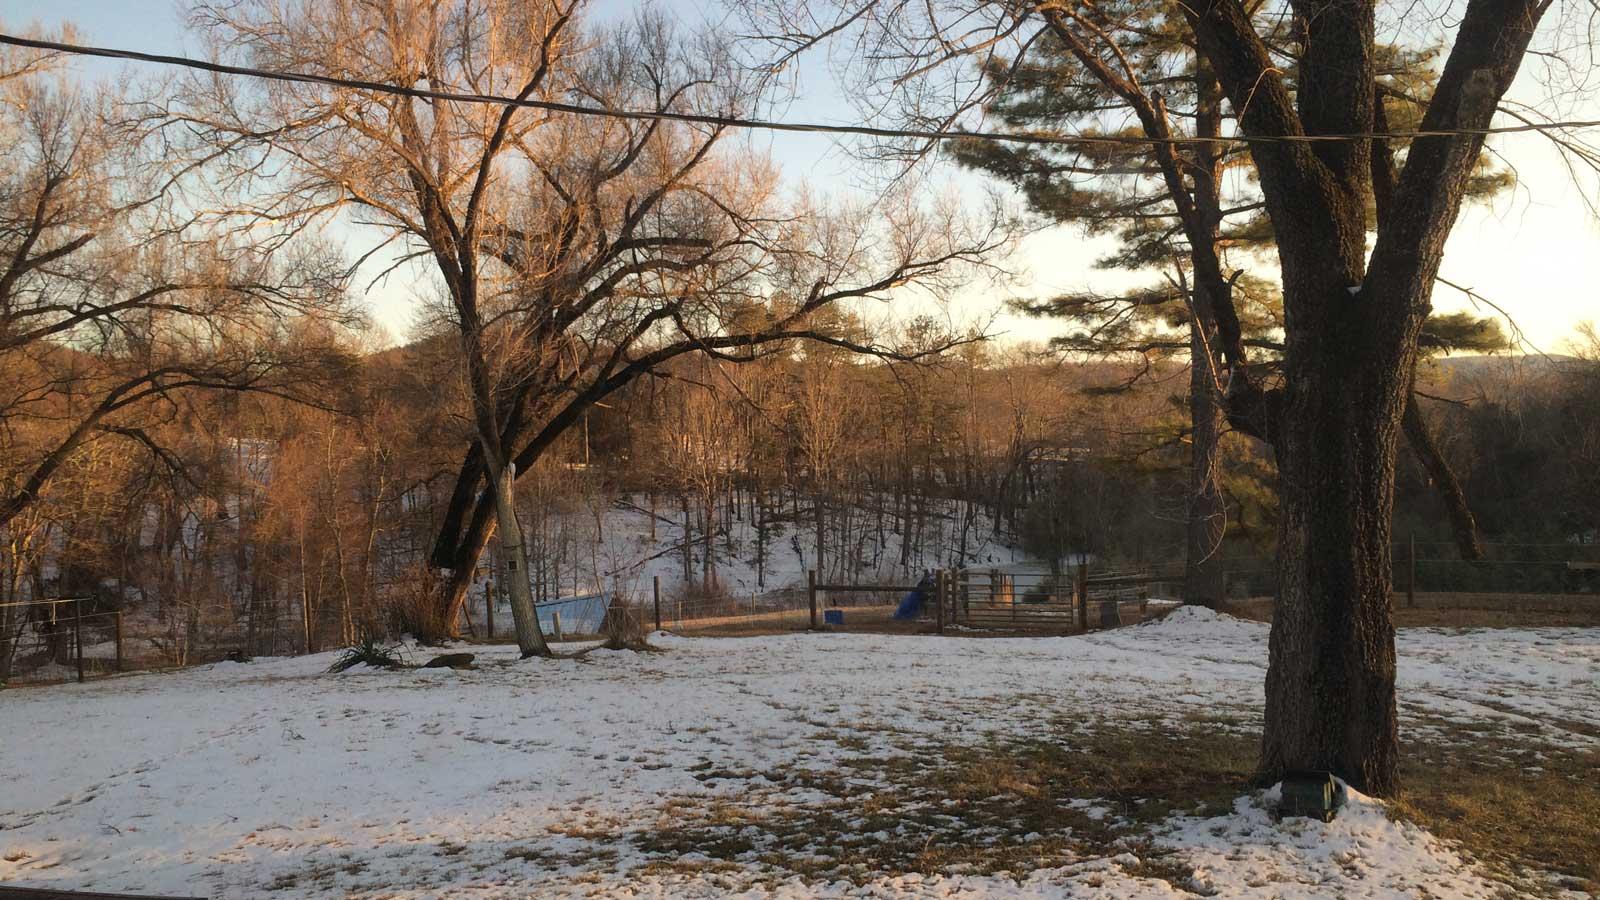 March 7 Snow